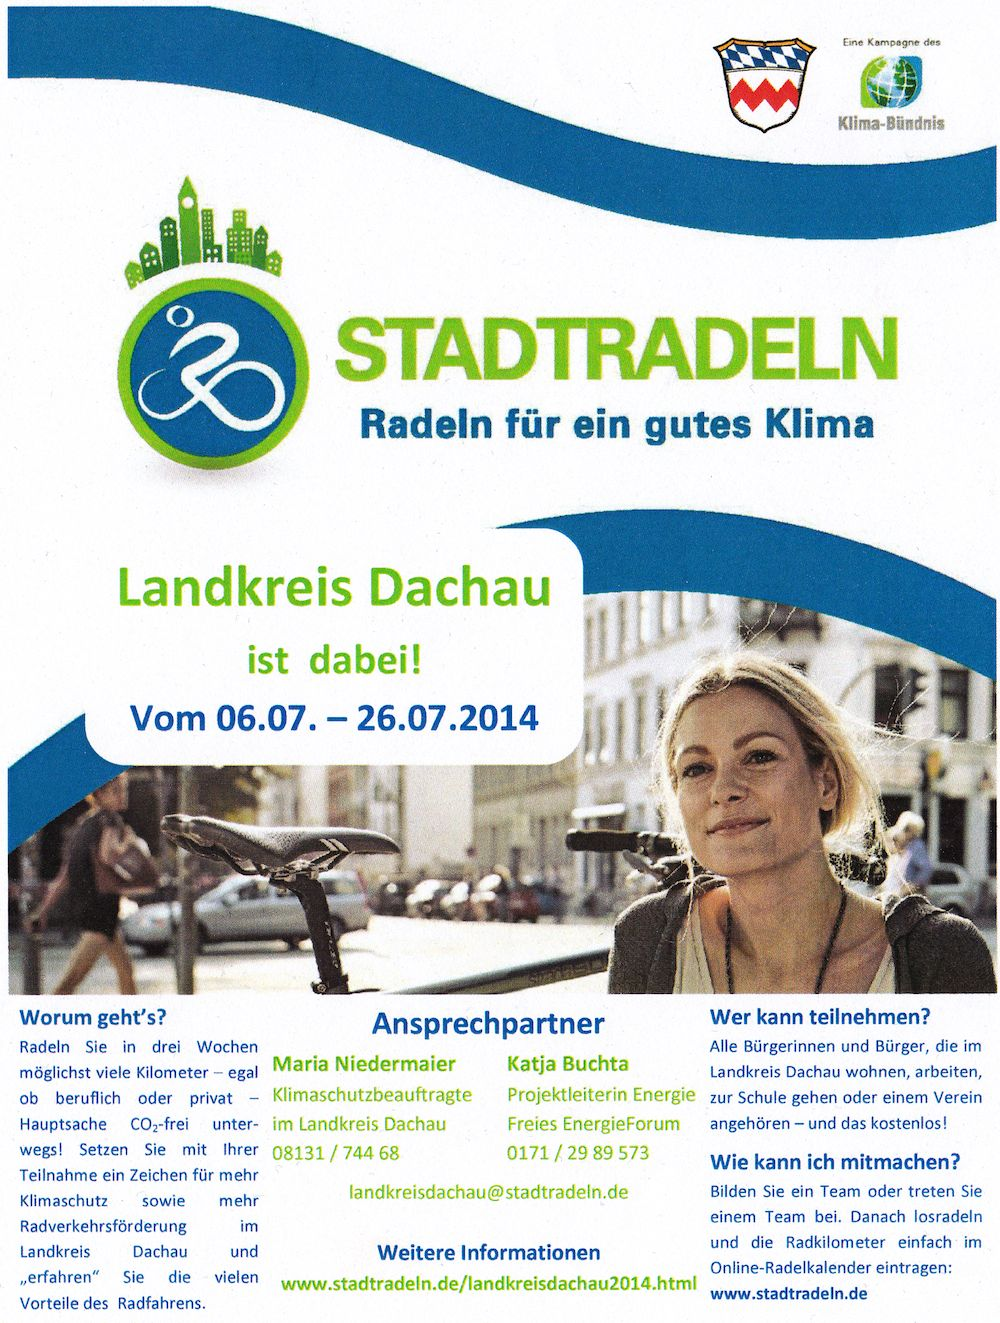 stadtradeln-dachau-2014